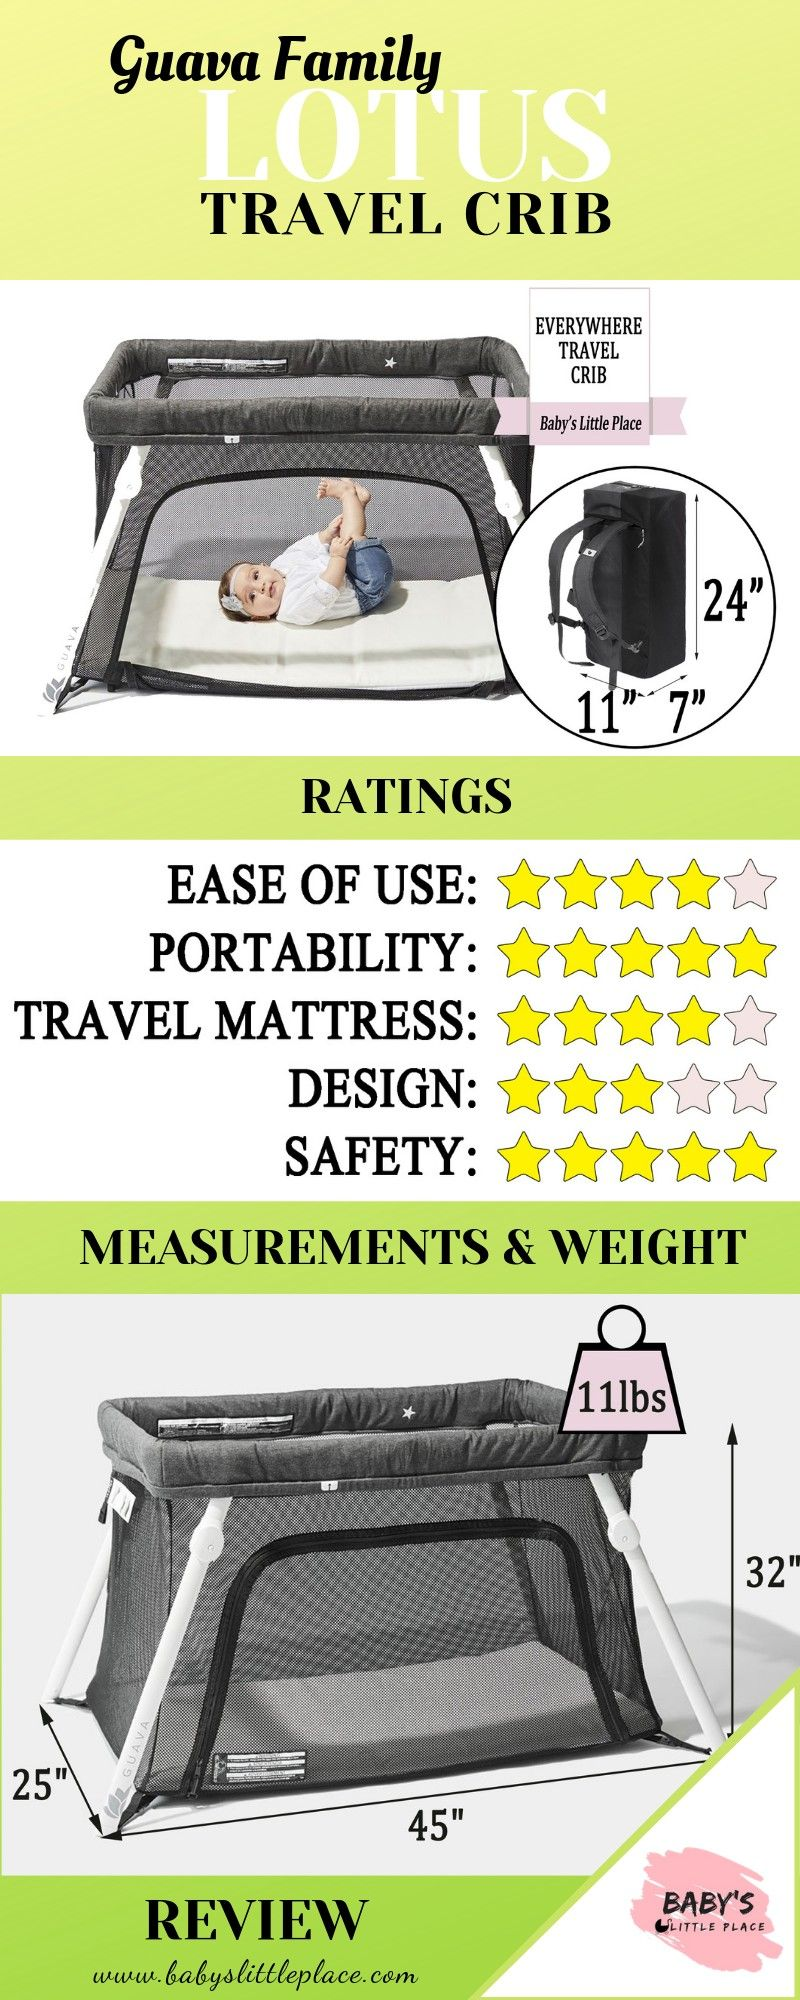 Guava Family Lotus Travel Crib Review Travel Crib Pack